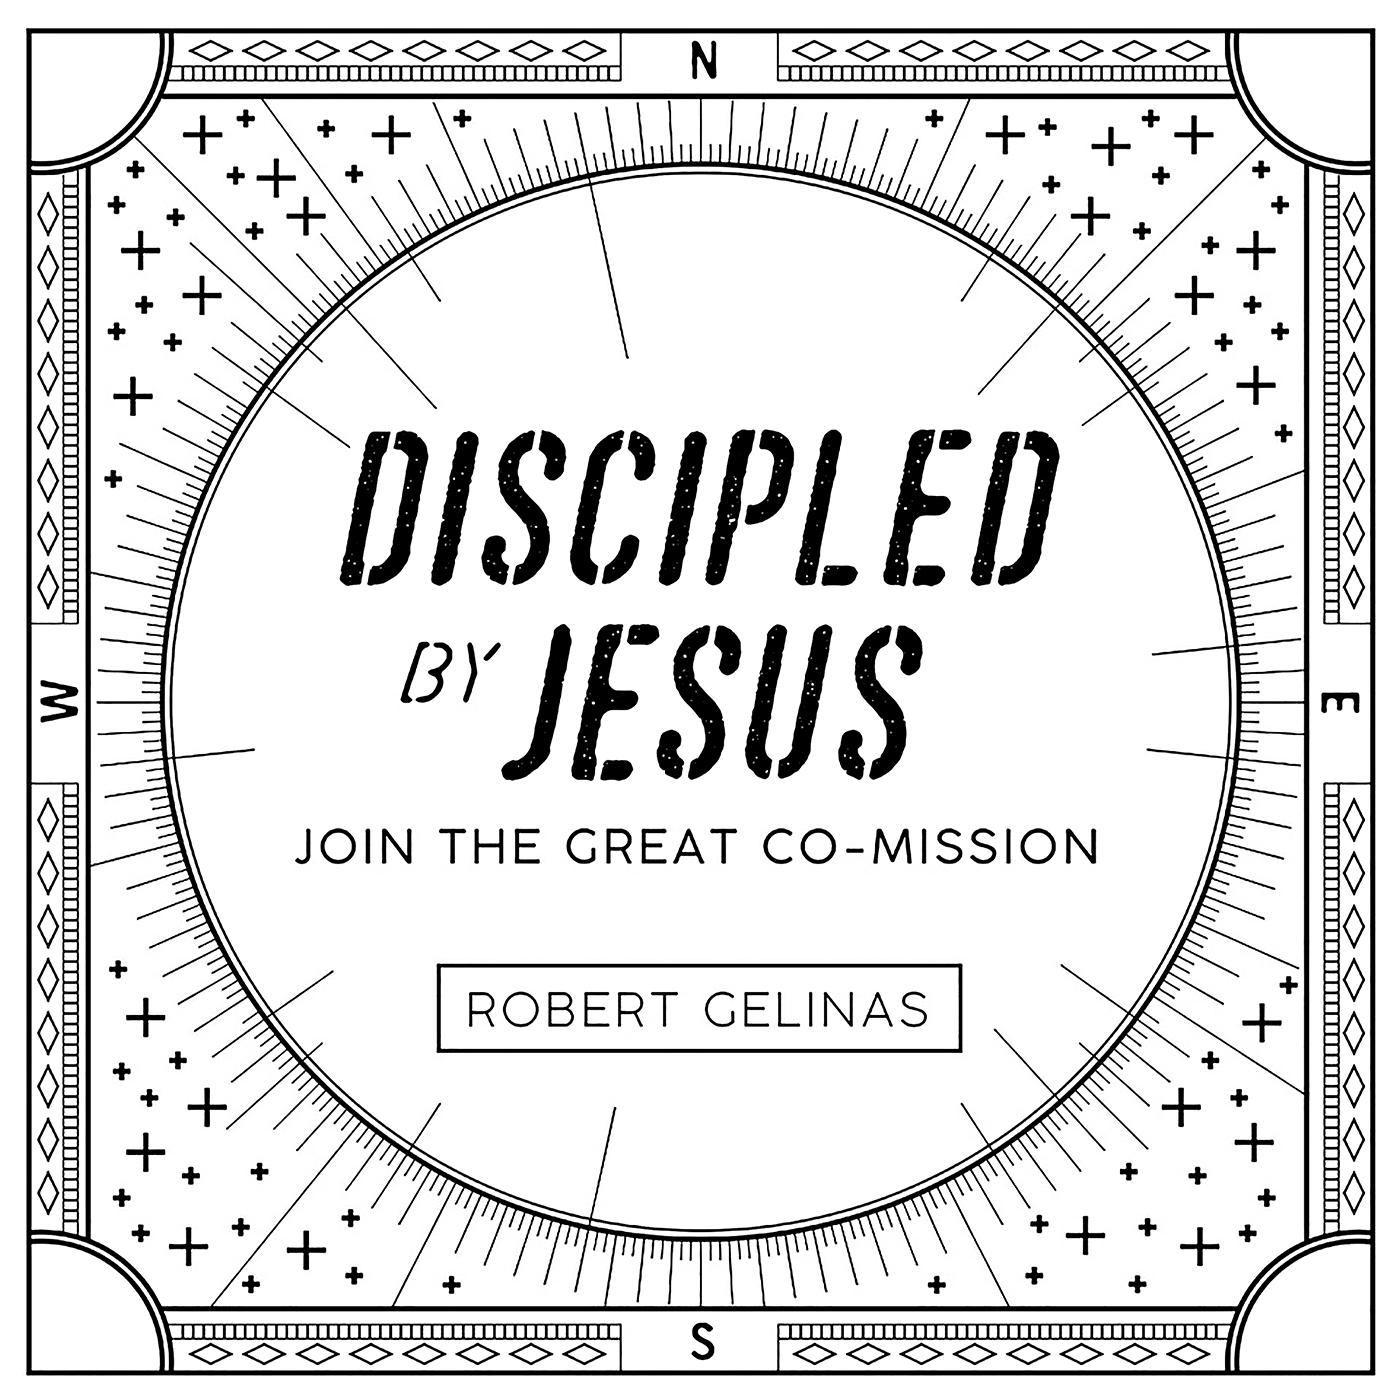 DiscipledByJesus-Podcast_1400x1400.jpg